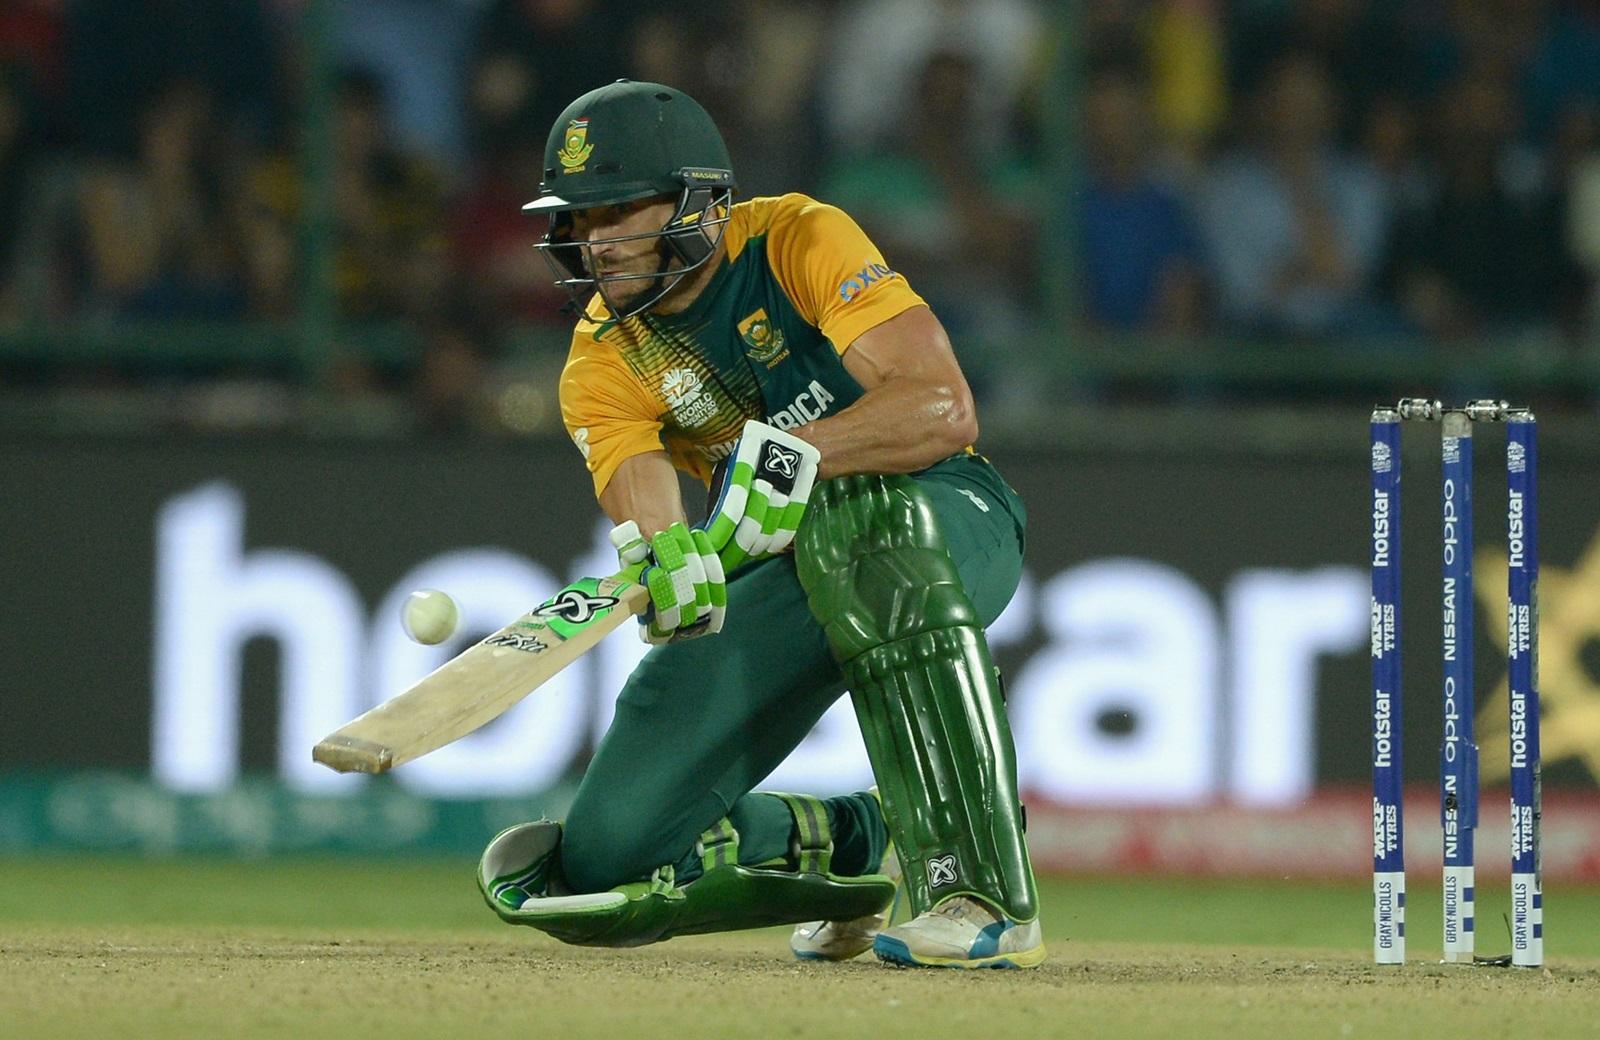 Du Plessis fined after controversial decision   cricket.com.au